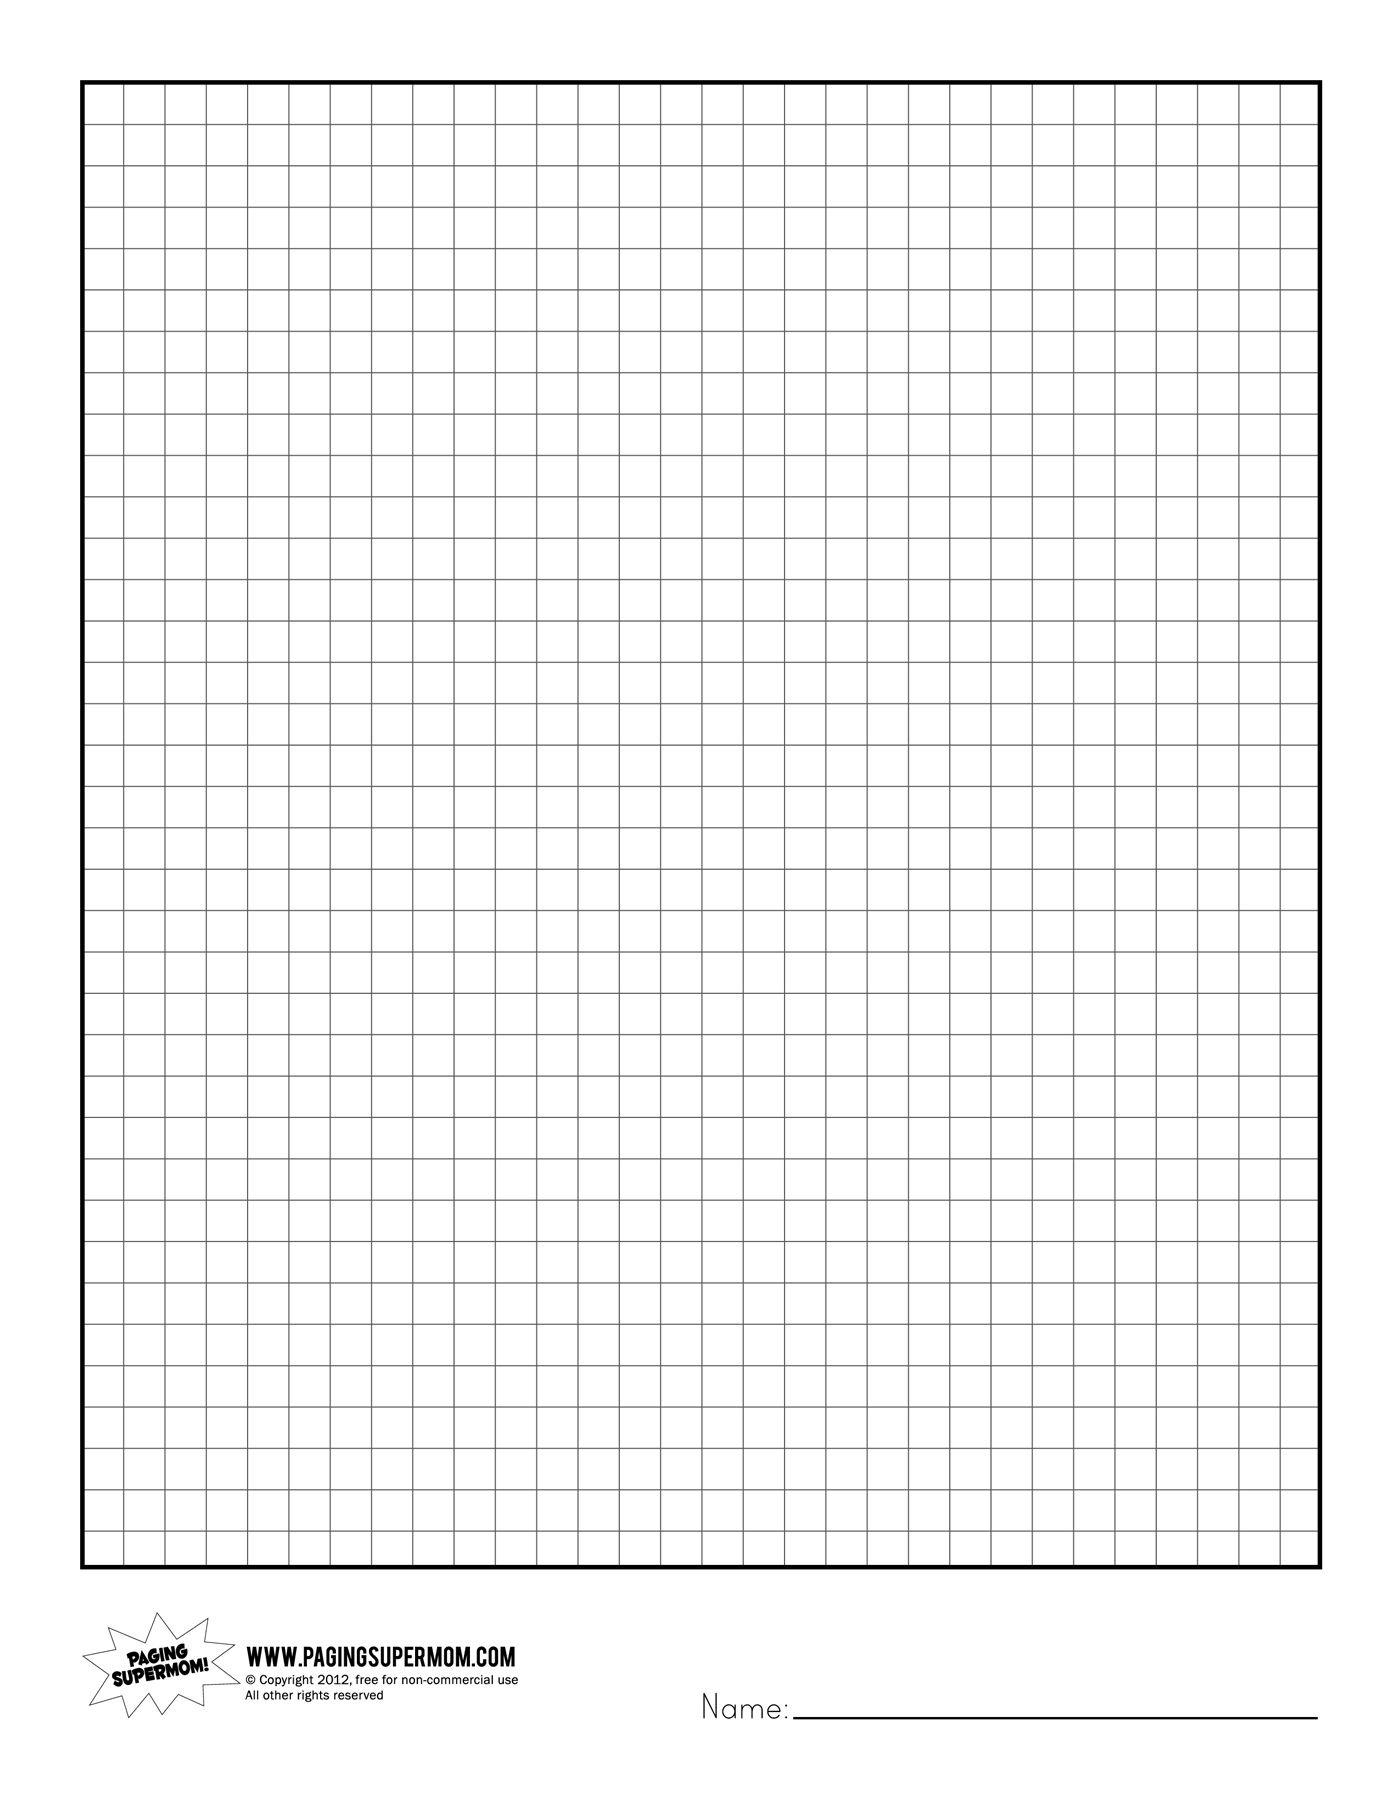 Printable Graph Paper | Healthy Eating | Printable Graph Paper, Grid - Free Printable Squared Paper